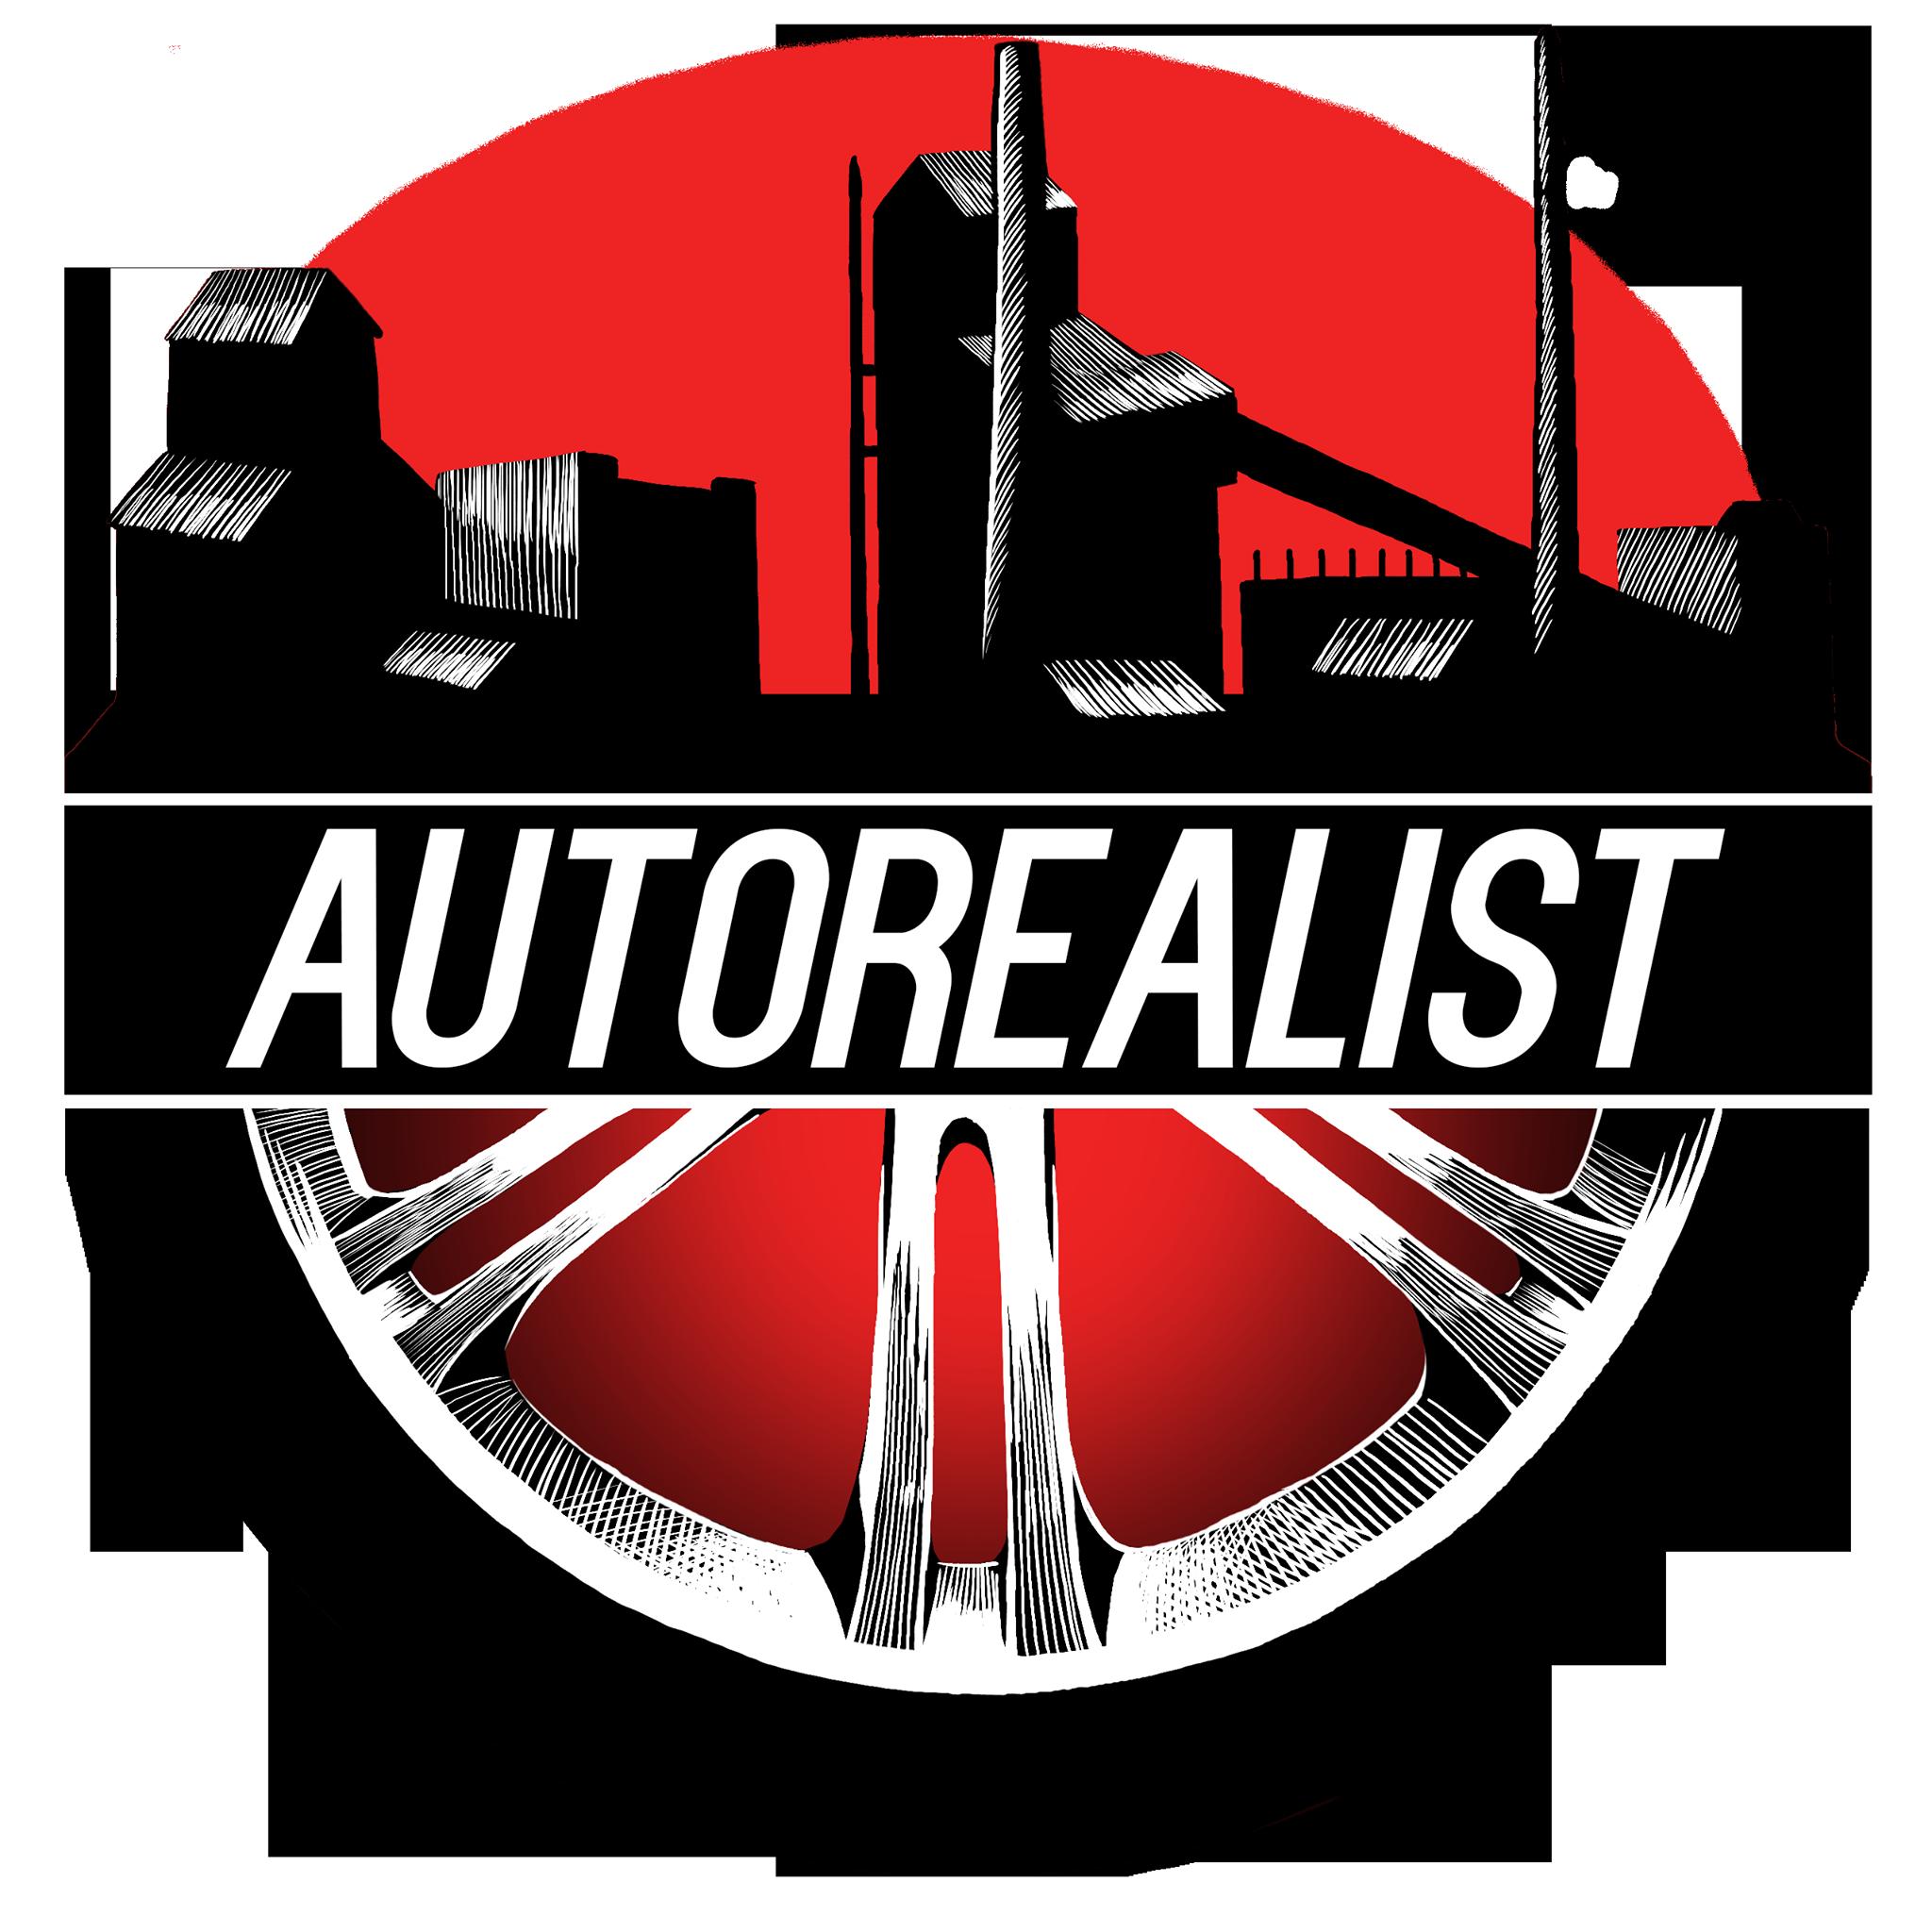 AUTOREALIST.COM